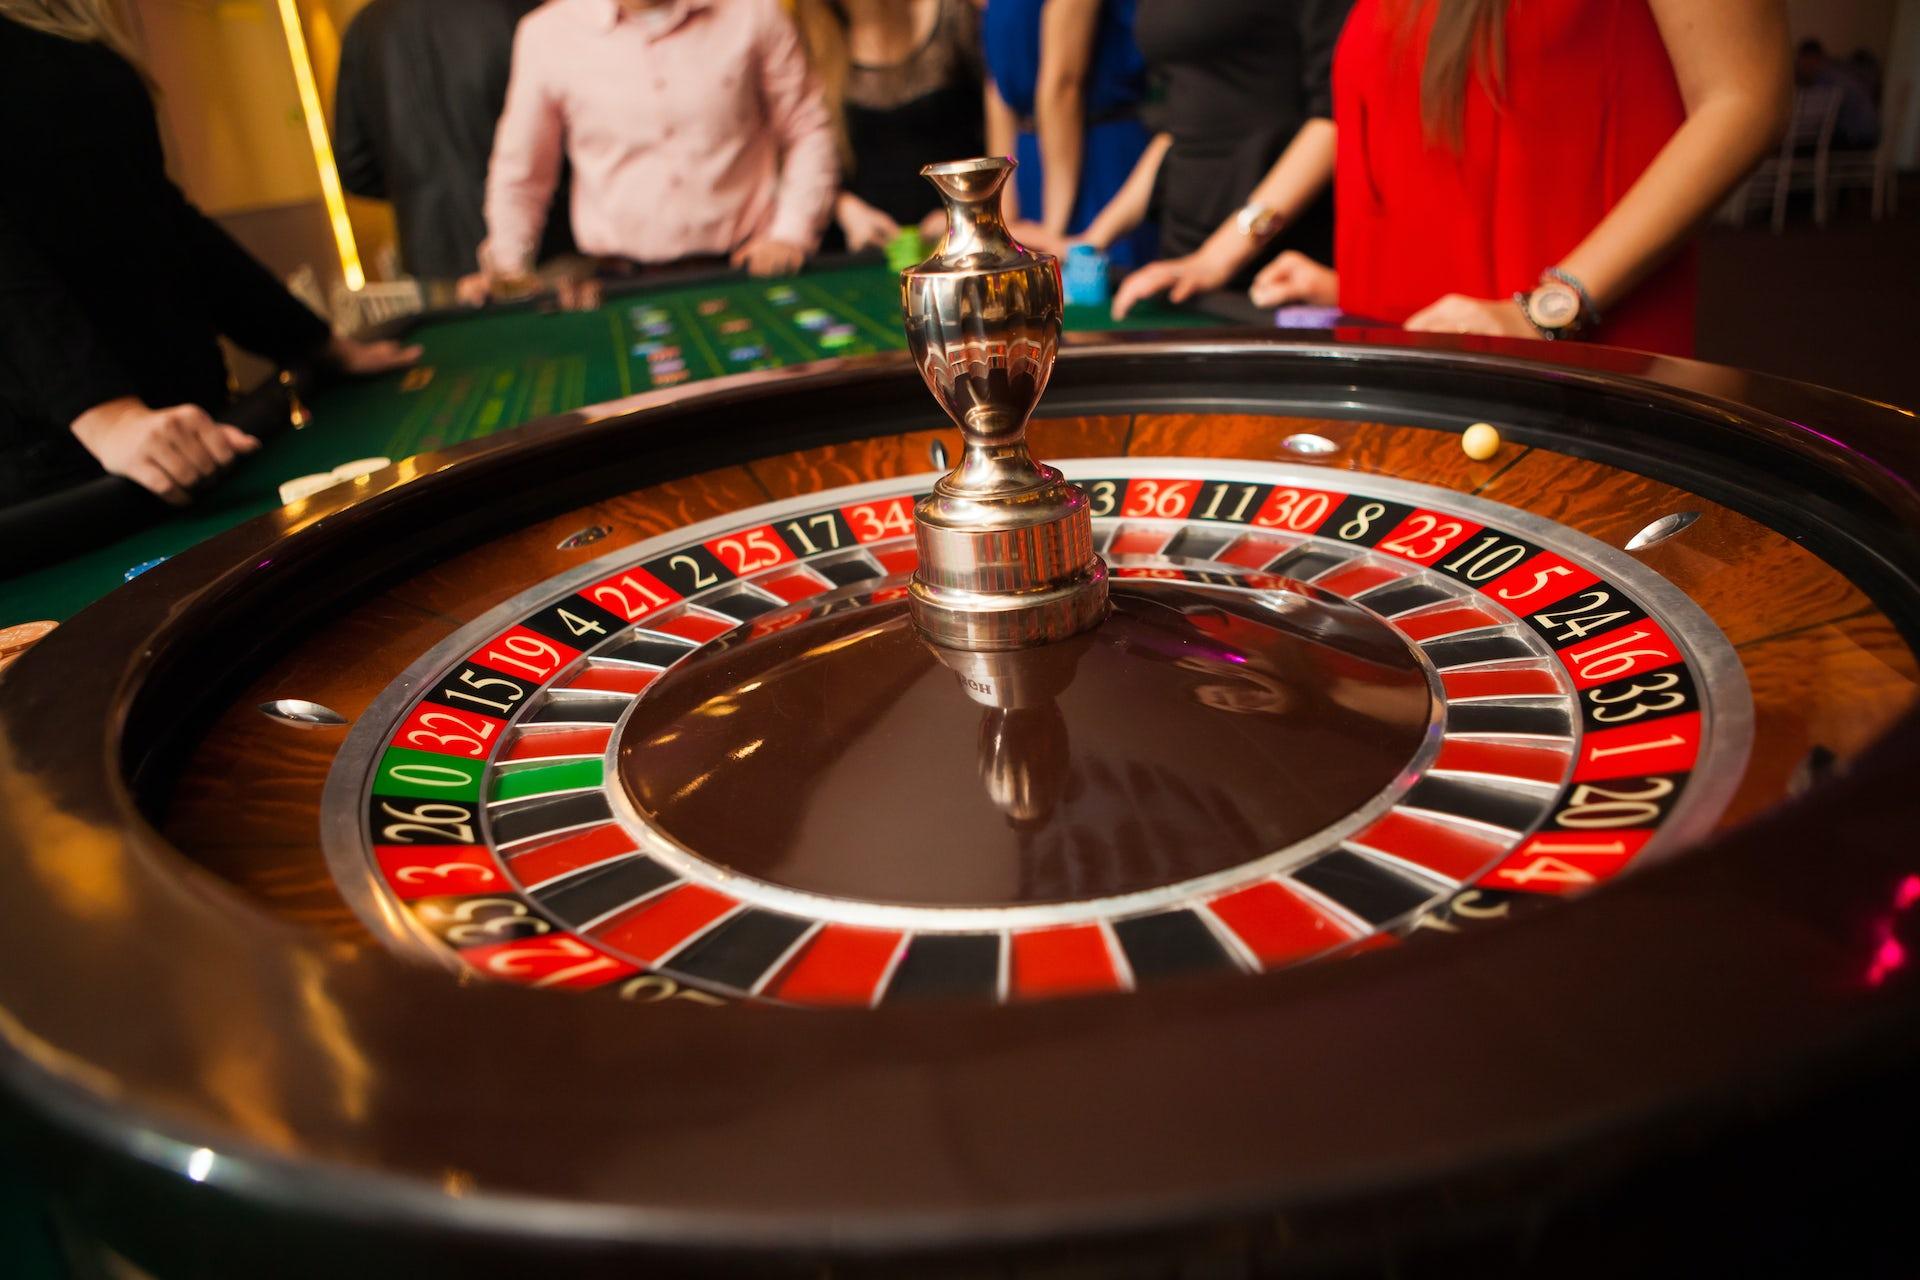 Win at roulette casino oscar gamble card